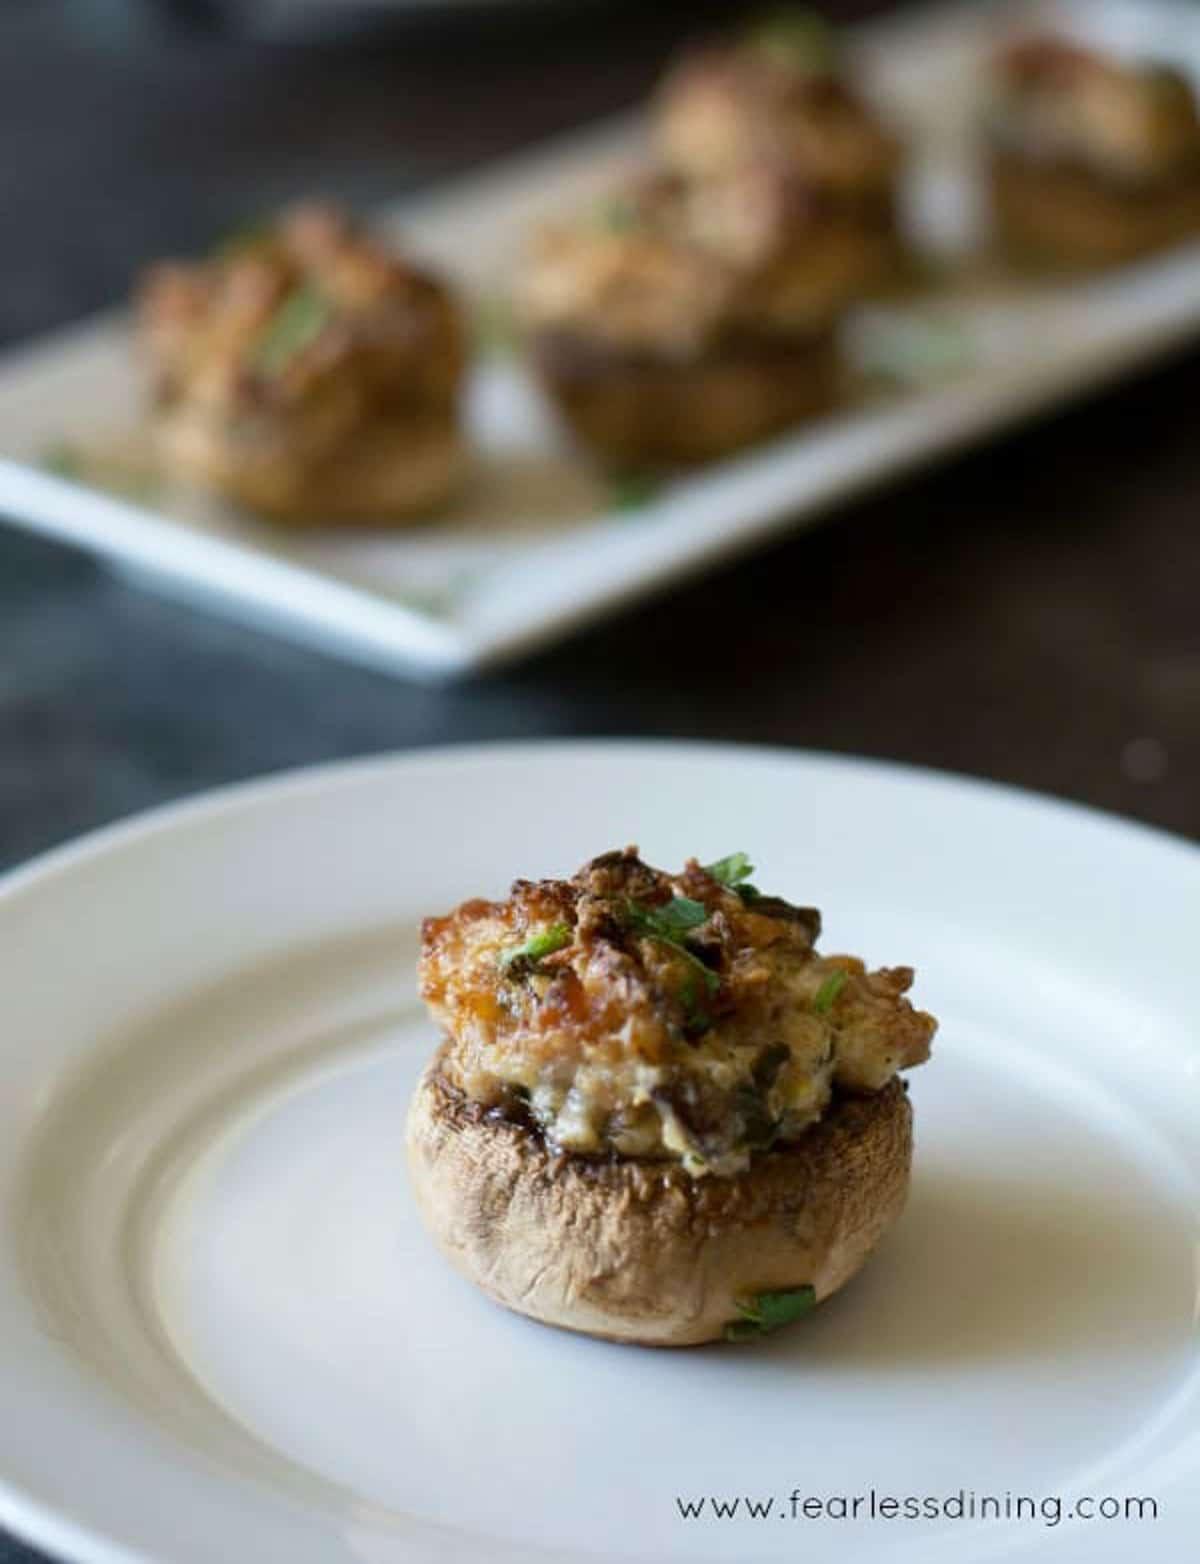 a stuffed mushroom on a plate.